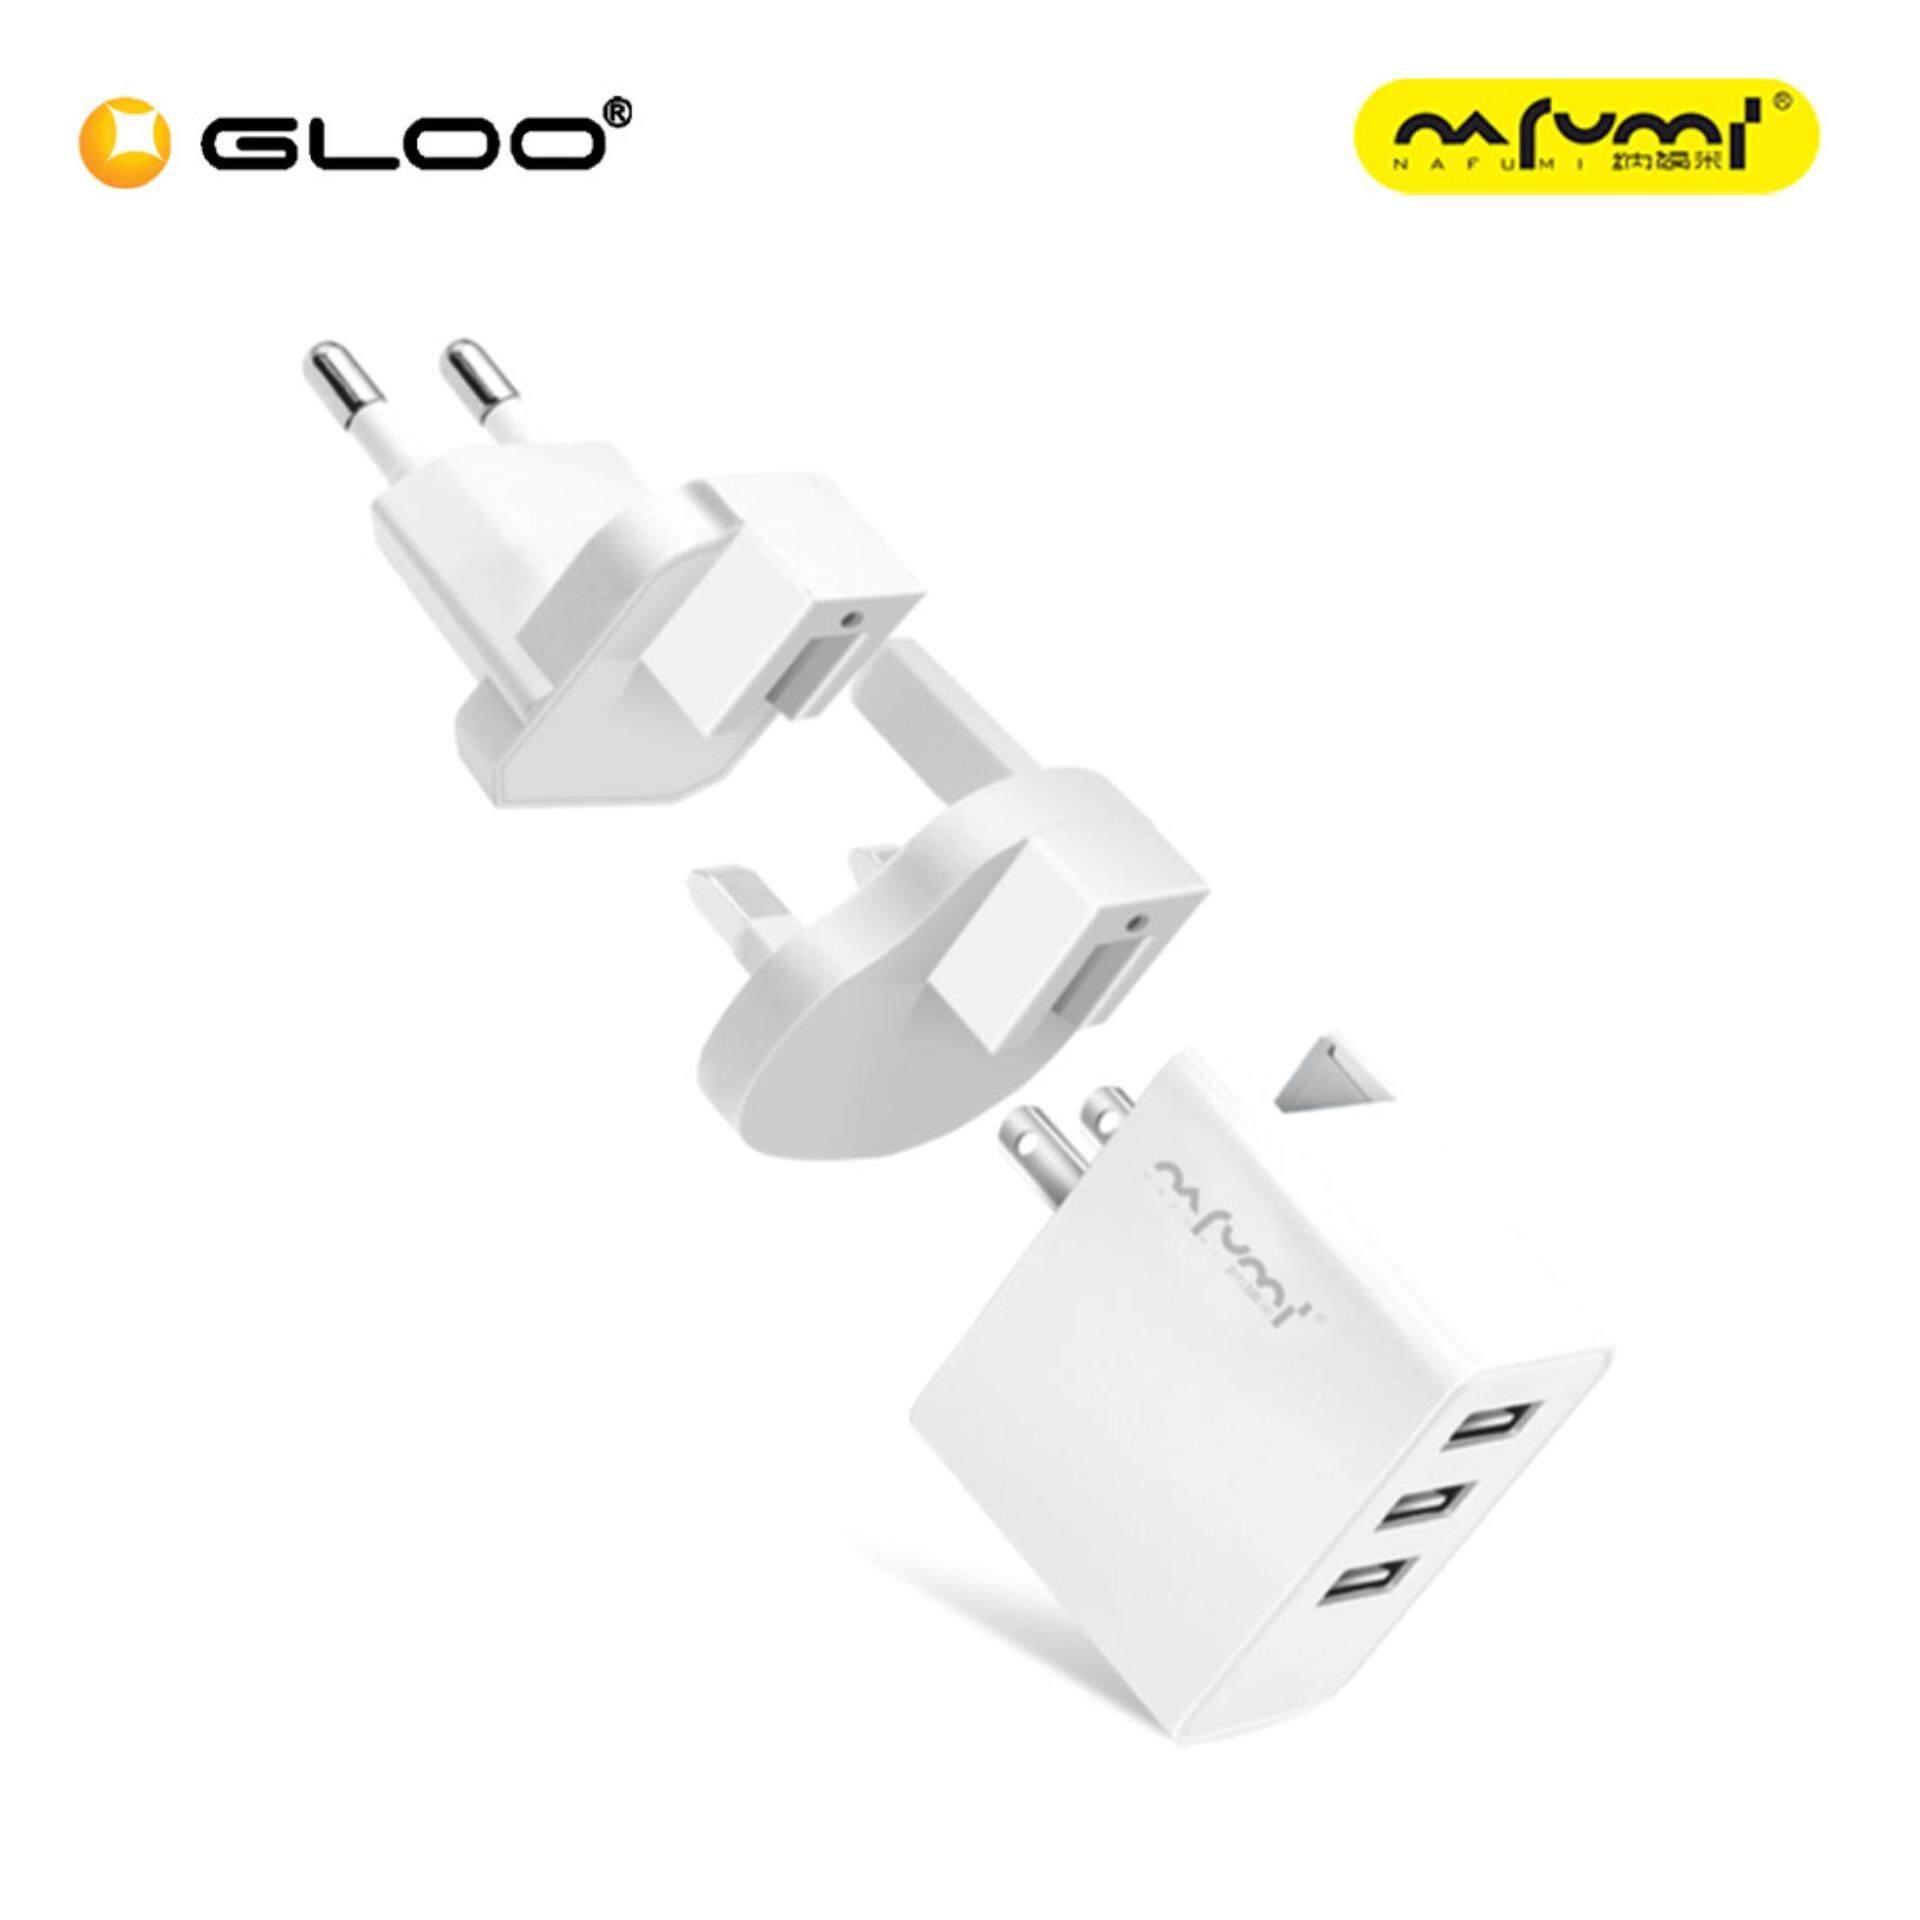 Nafumi Q28 Universal Quick Fast Charge USB charger